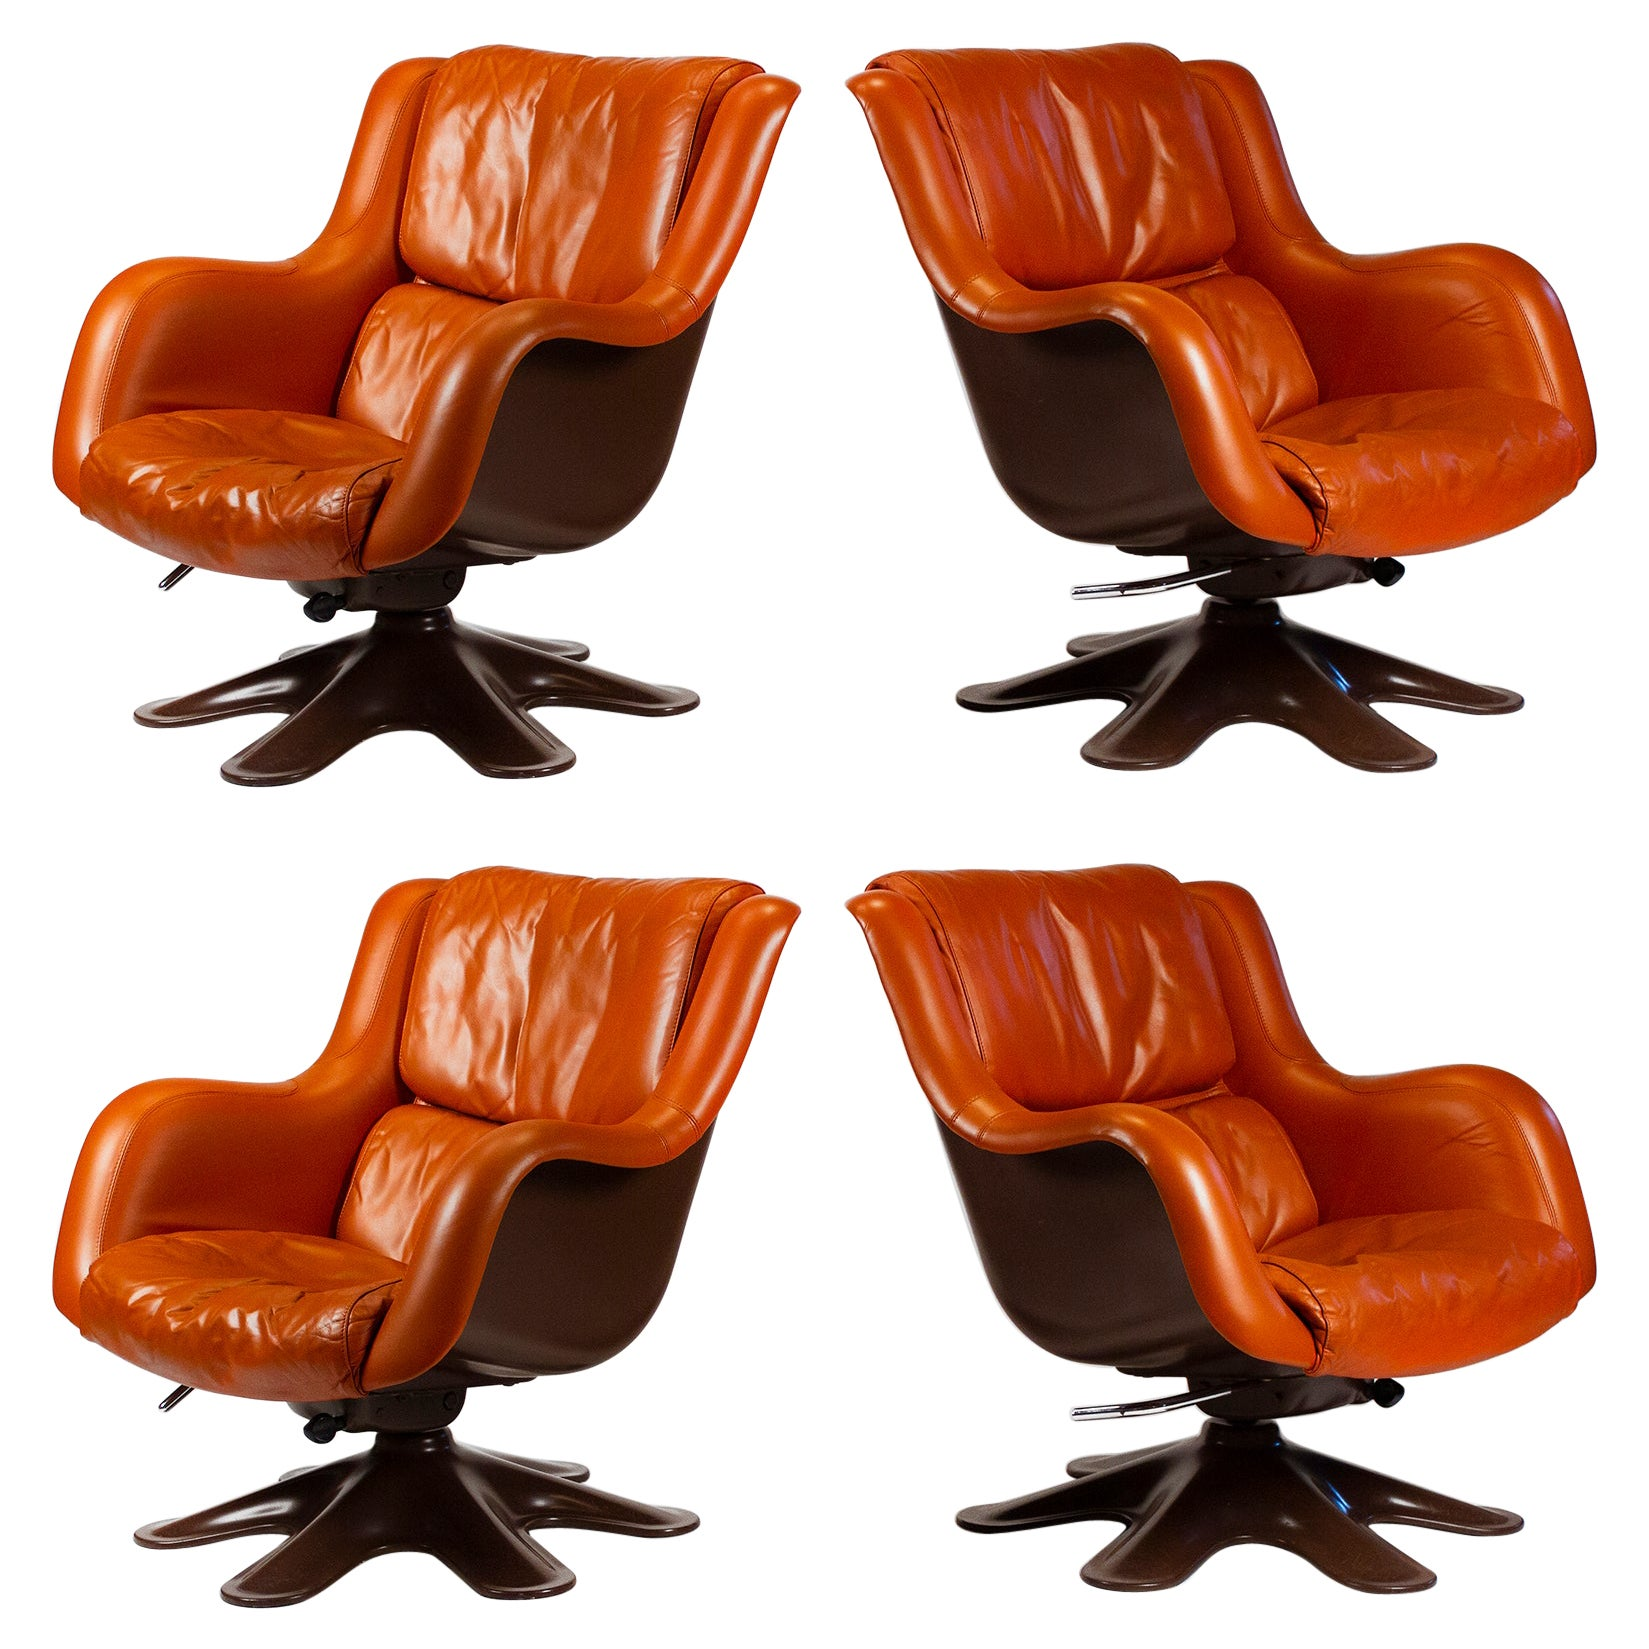 Yrjo Kukkapuro Karuselli Easy Chairs and Ottoman in Leather Model 418 for Haimi